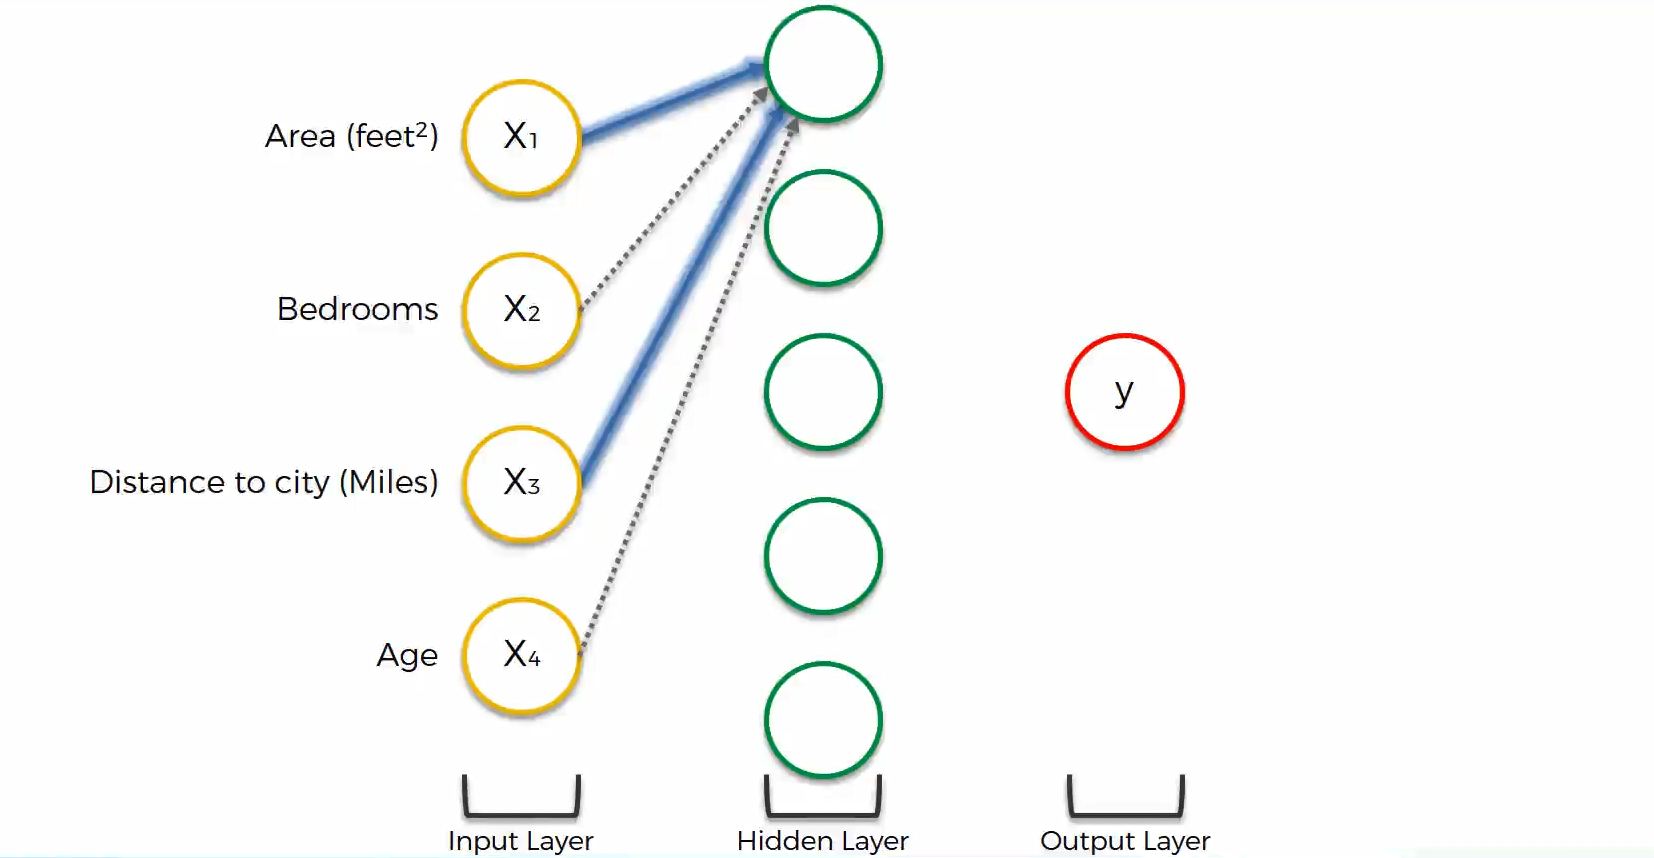 Maschinenlernen. Deep Learning. Künstliche Neuronale Netzwerke. Einführung Schritt 8